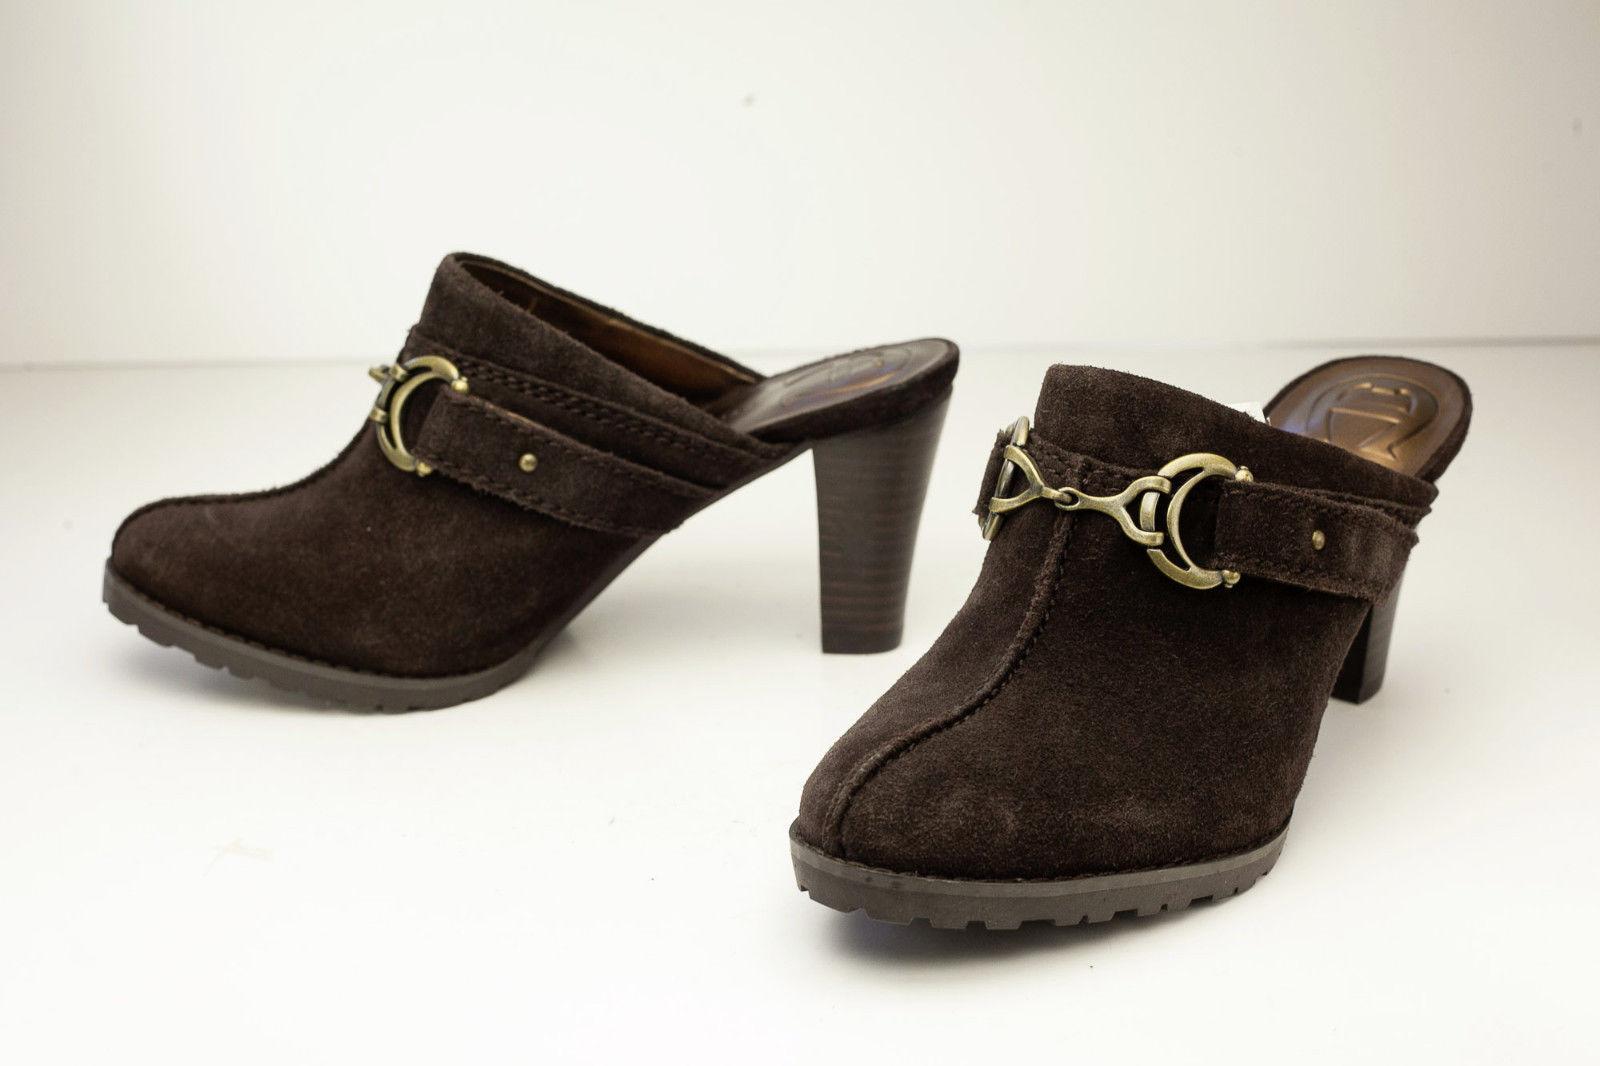 Etienne Aigner 6 Brown Mules Women's Shoes